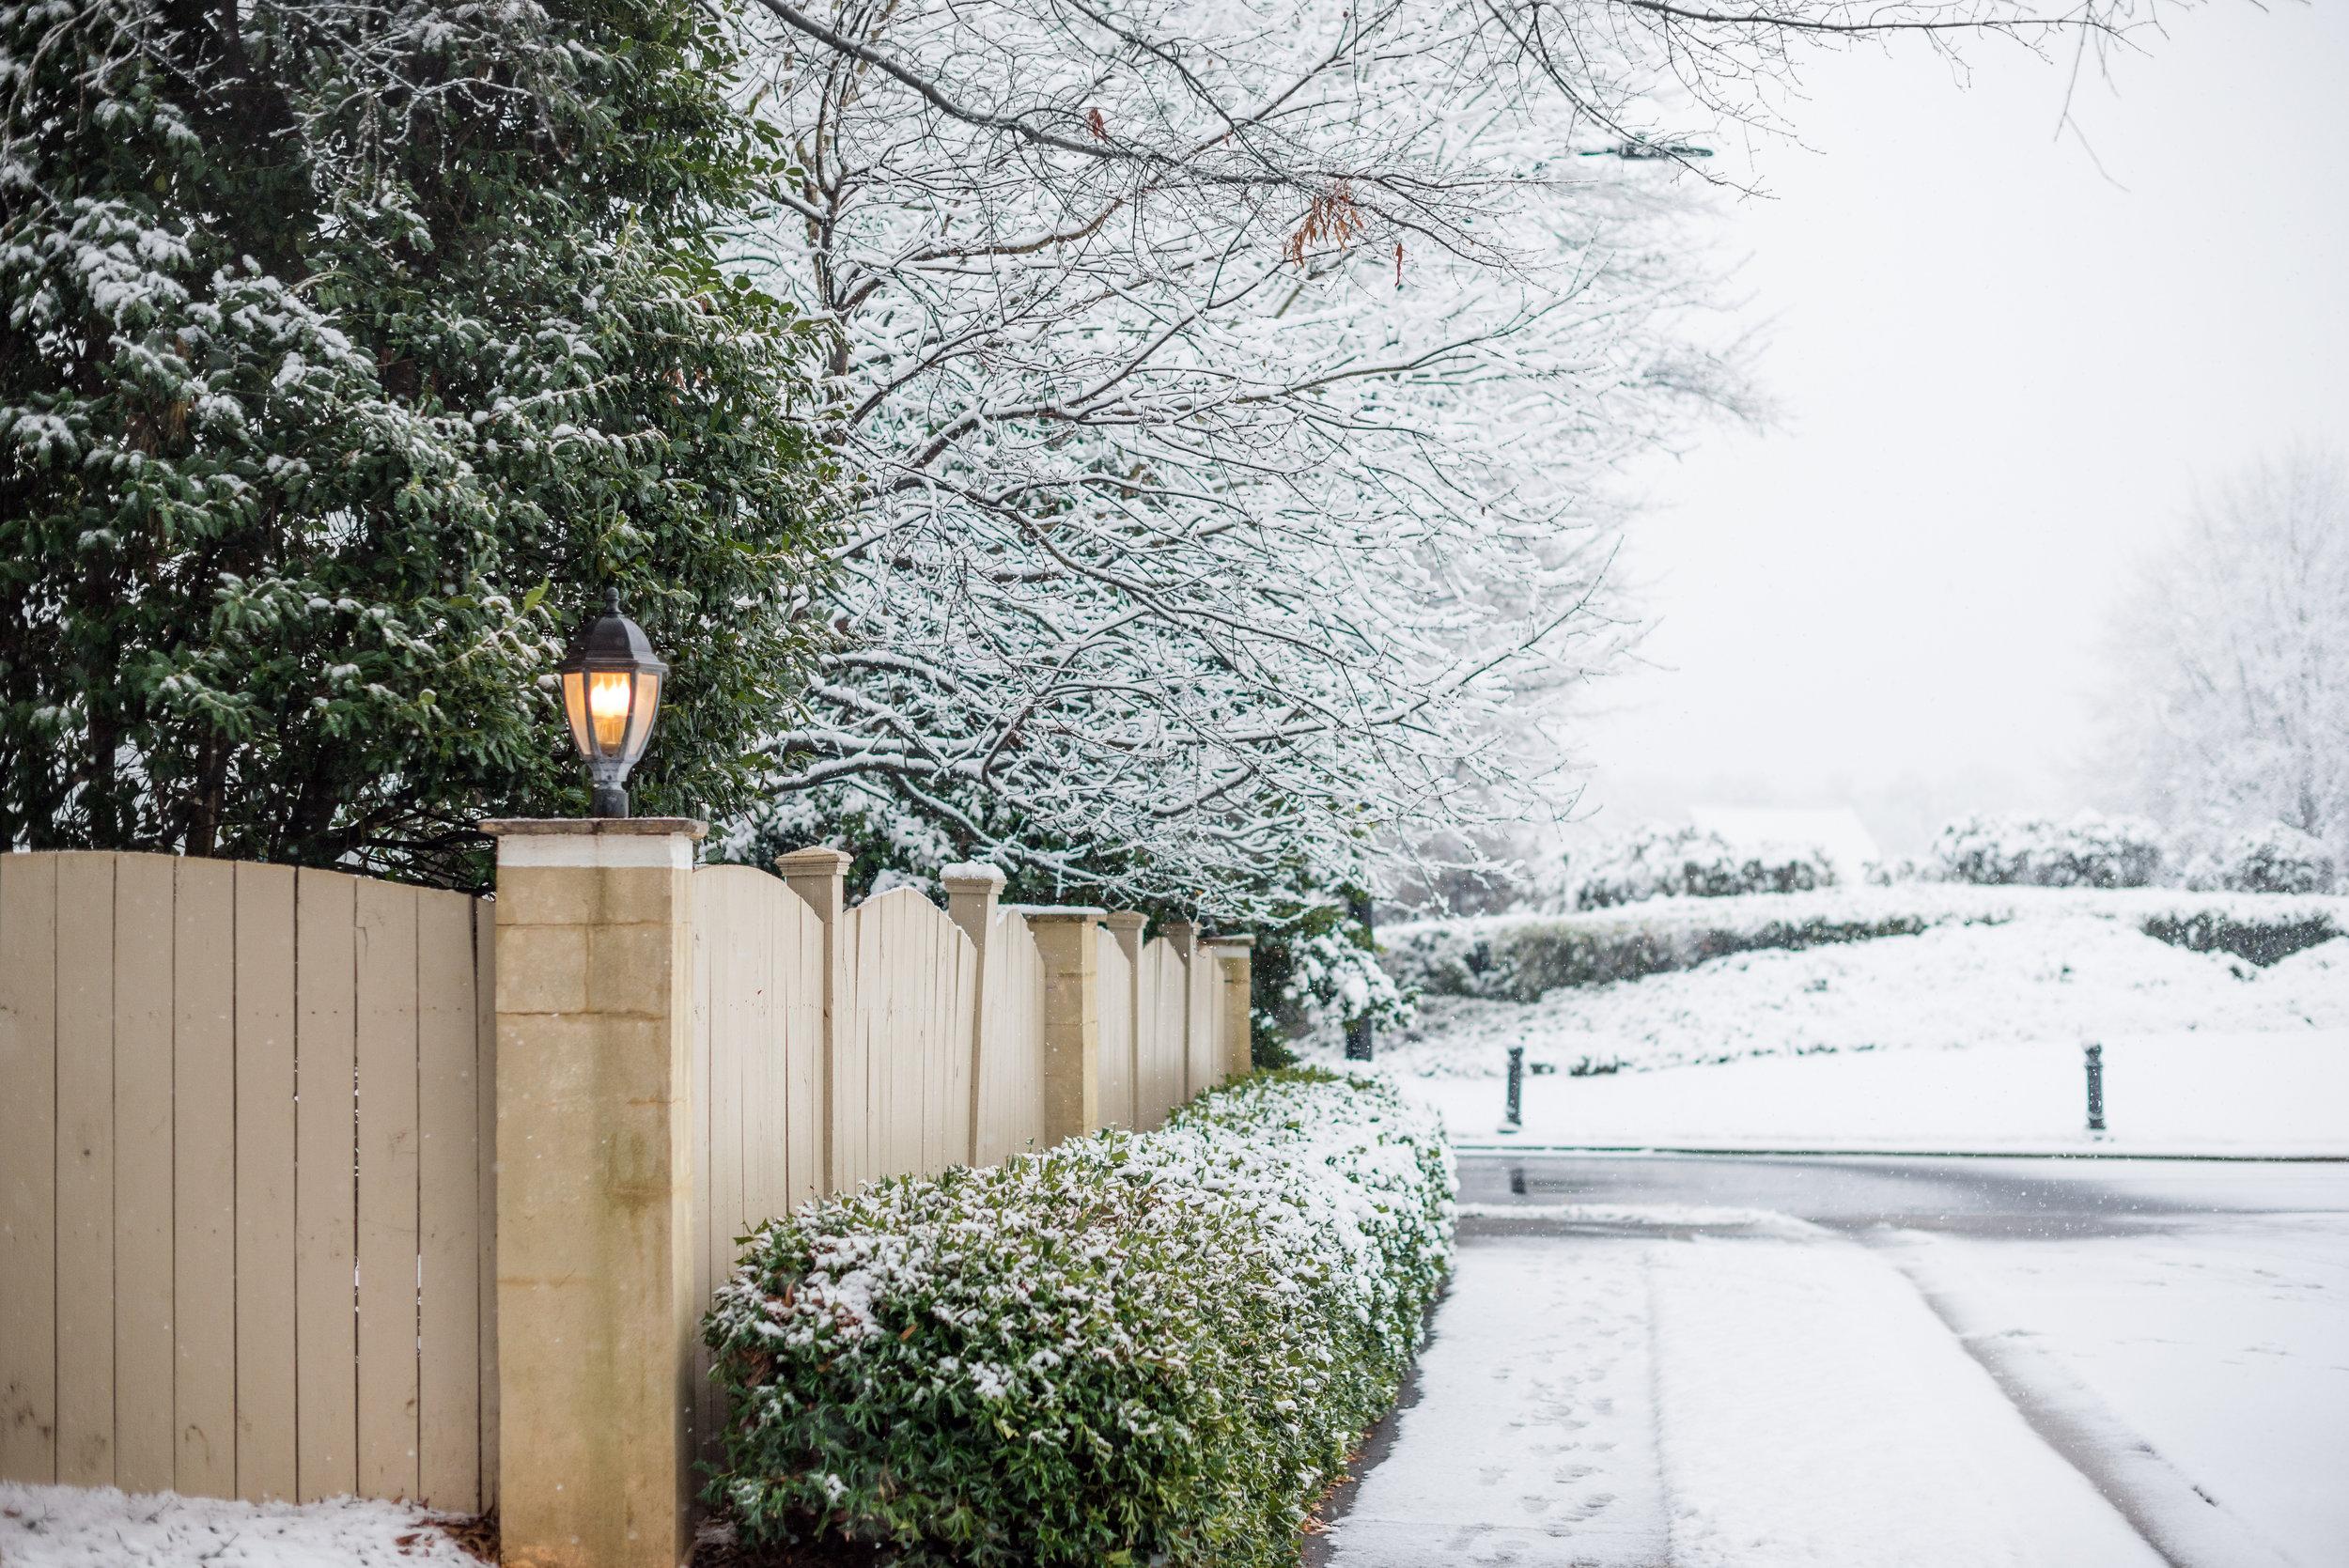 jaclyn-auletta-photography-winter-2018-4.jpg